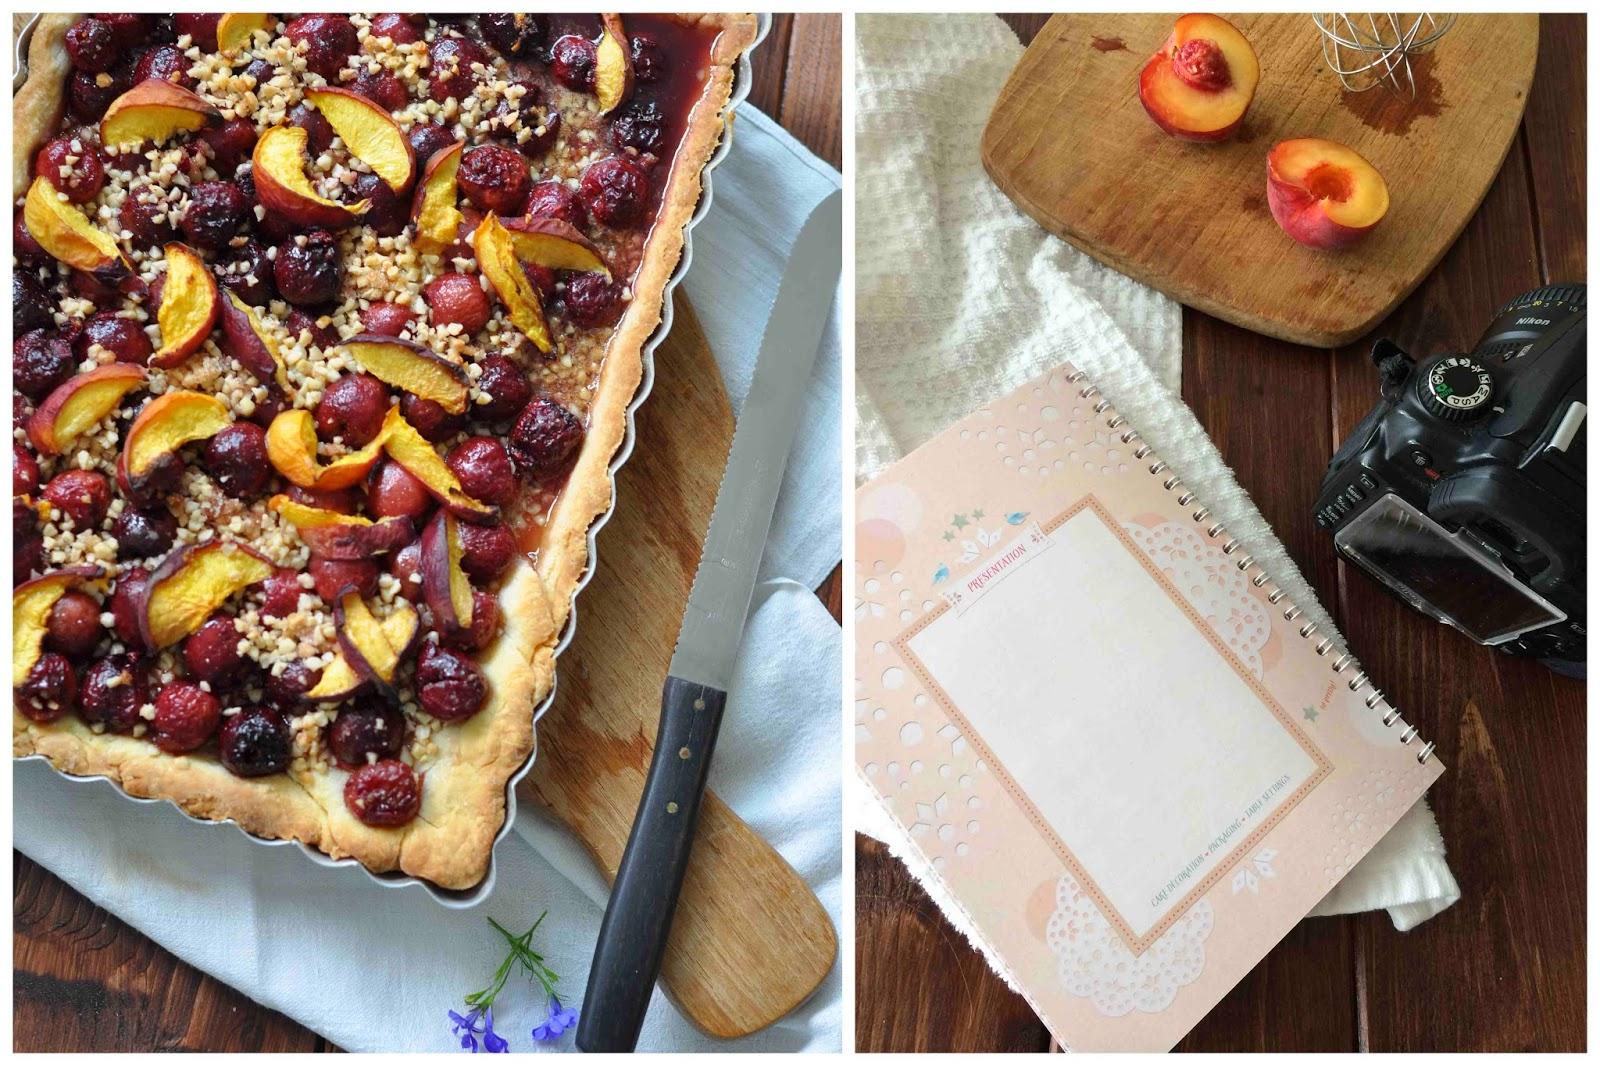 Backen Baking Pie Cherries Peach Foodphotography